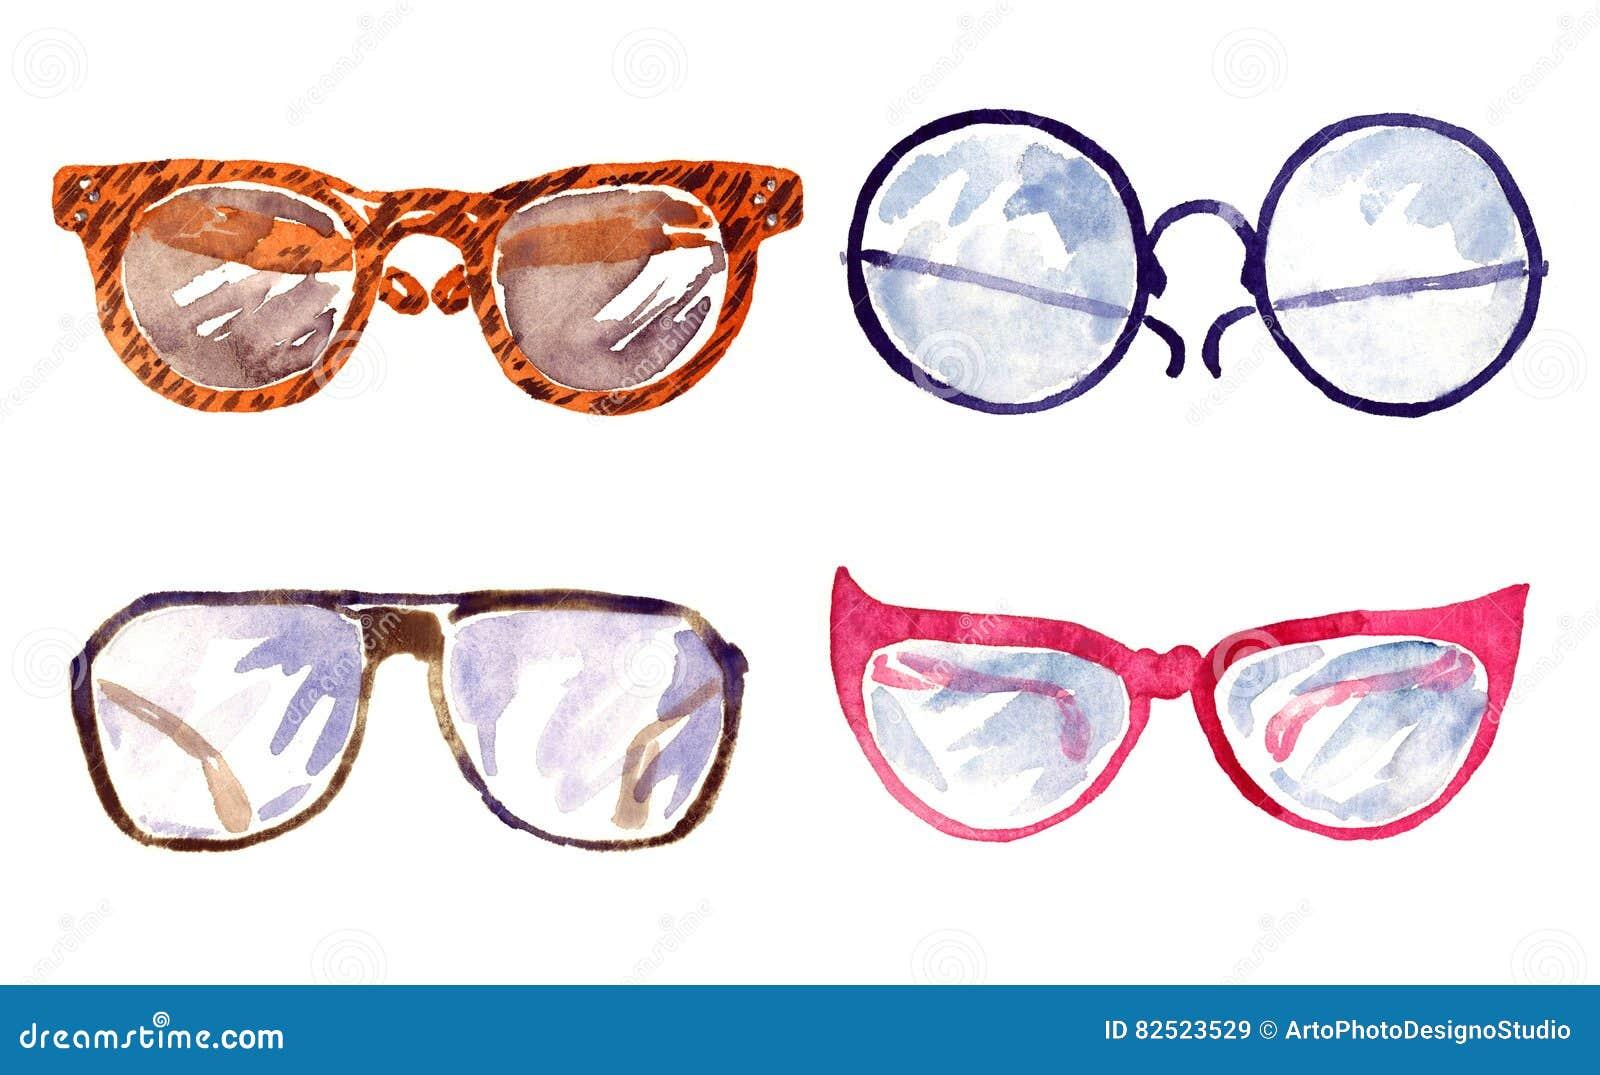 c8971d7ebf3 Shapes Of Male And Female Glasses Stock Illustration - Illustration ...